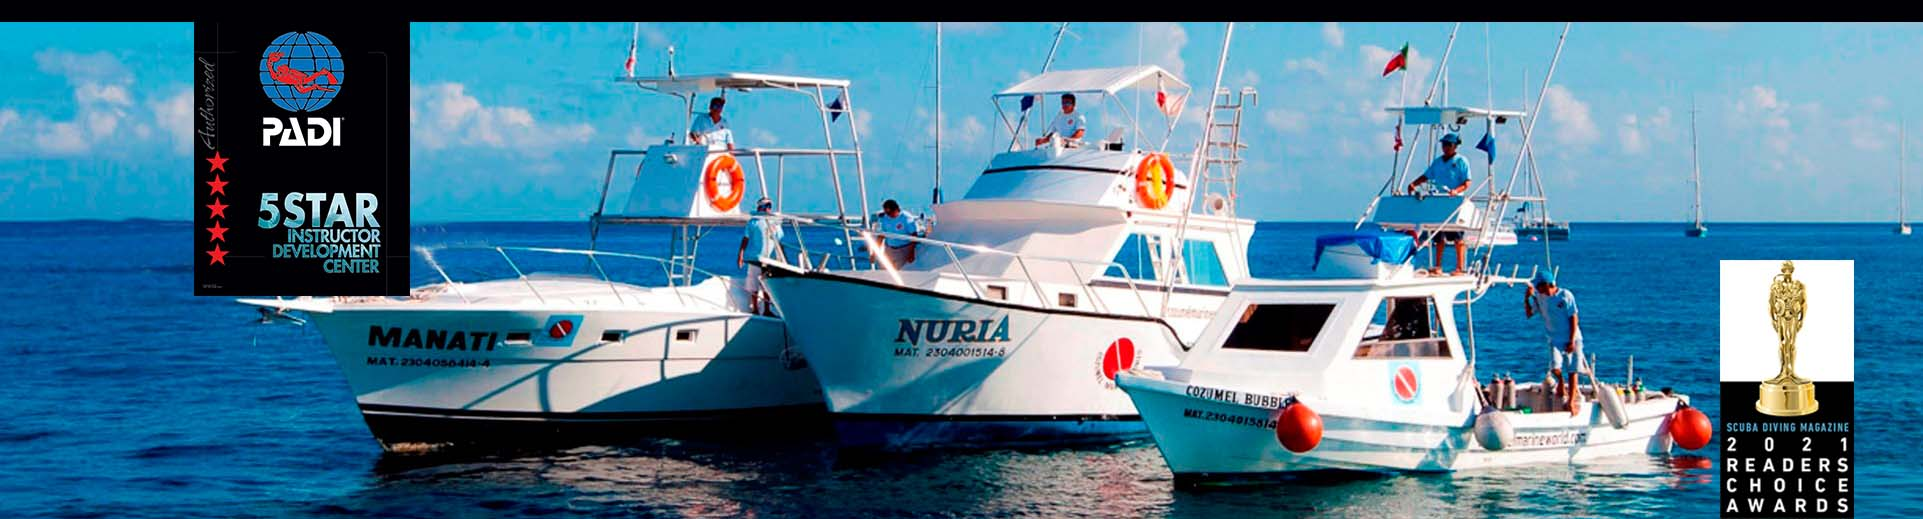 welcome to cozumel marine world 2020